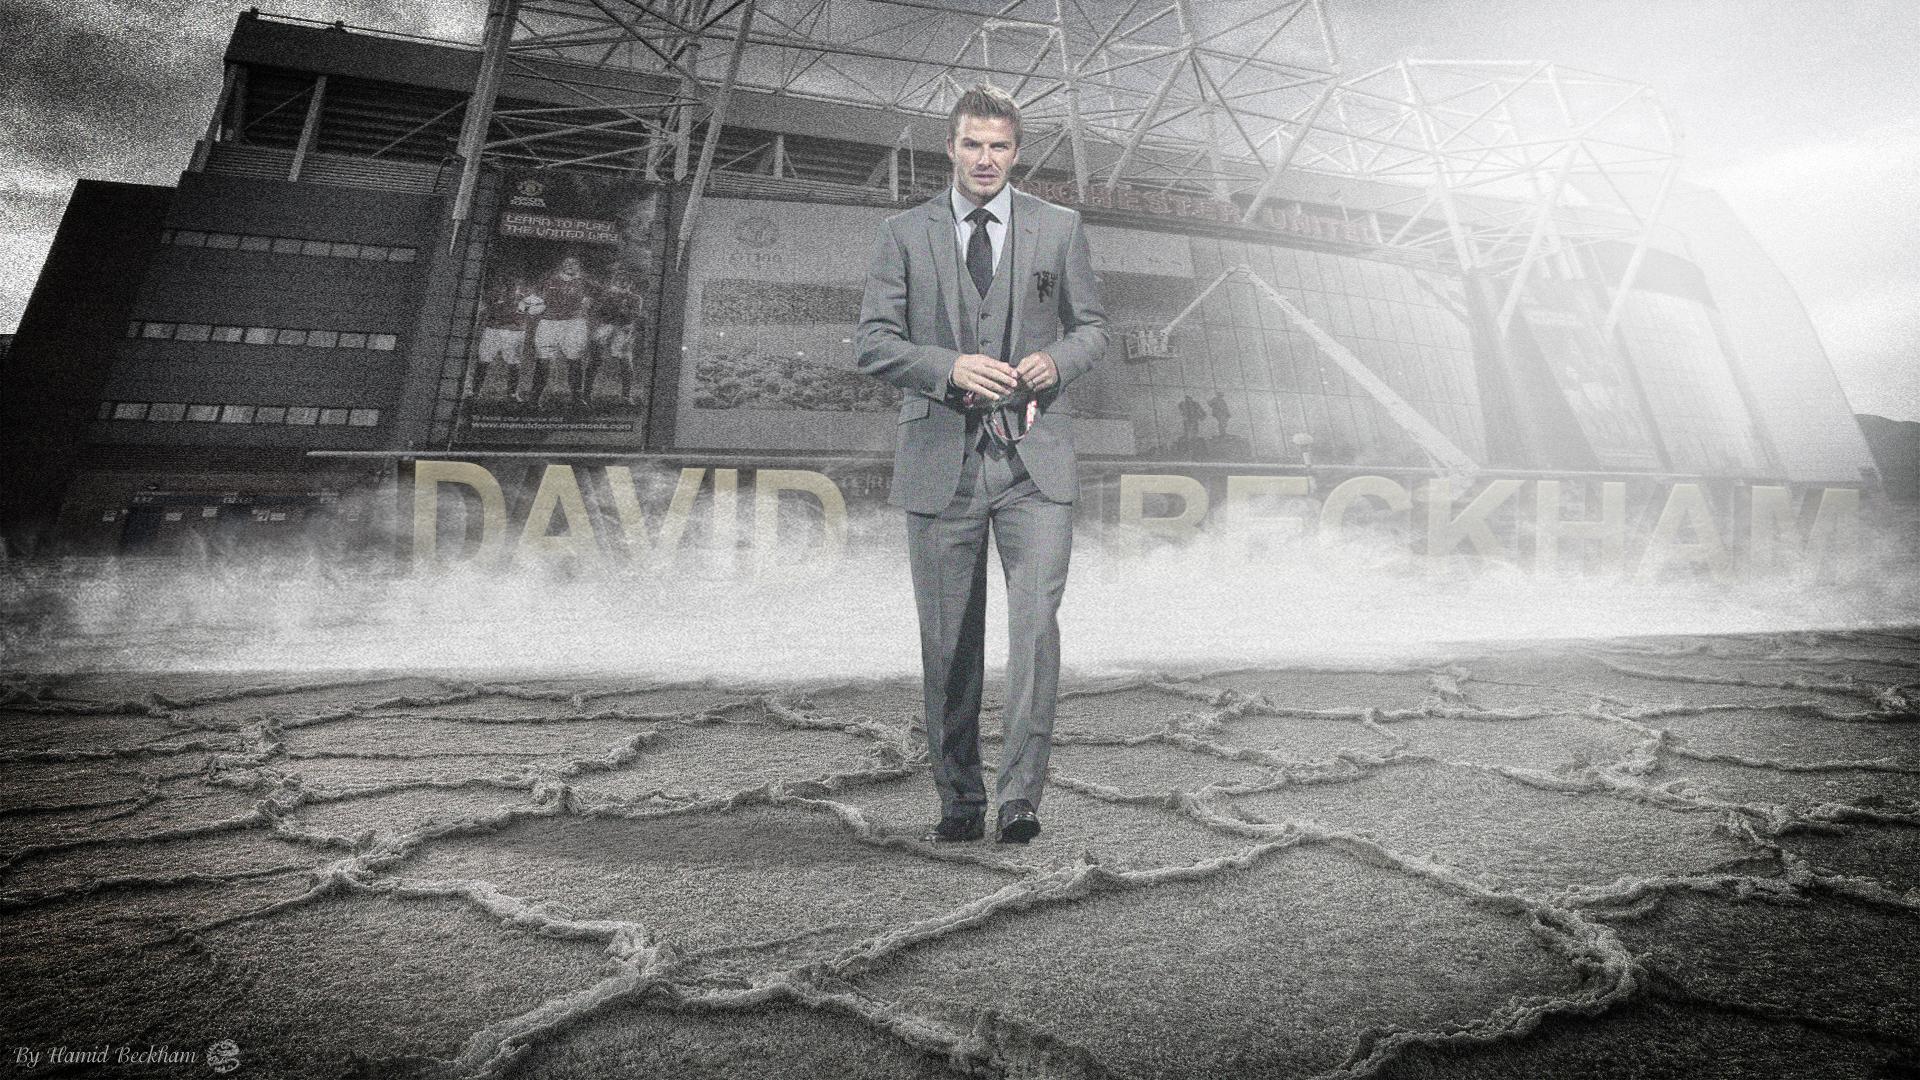 David beckham legend manchester united by hamidbeckham on - Manchester united david beckham wallpaper ...